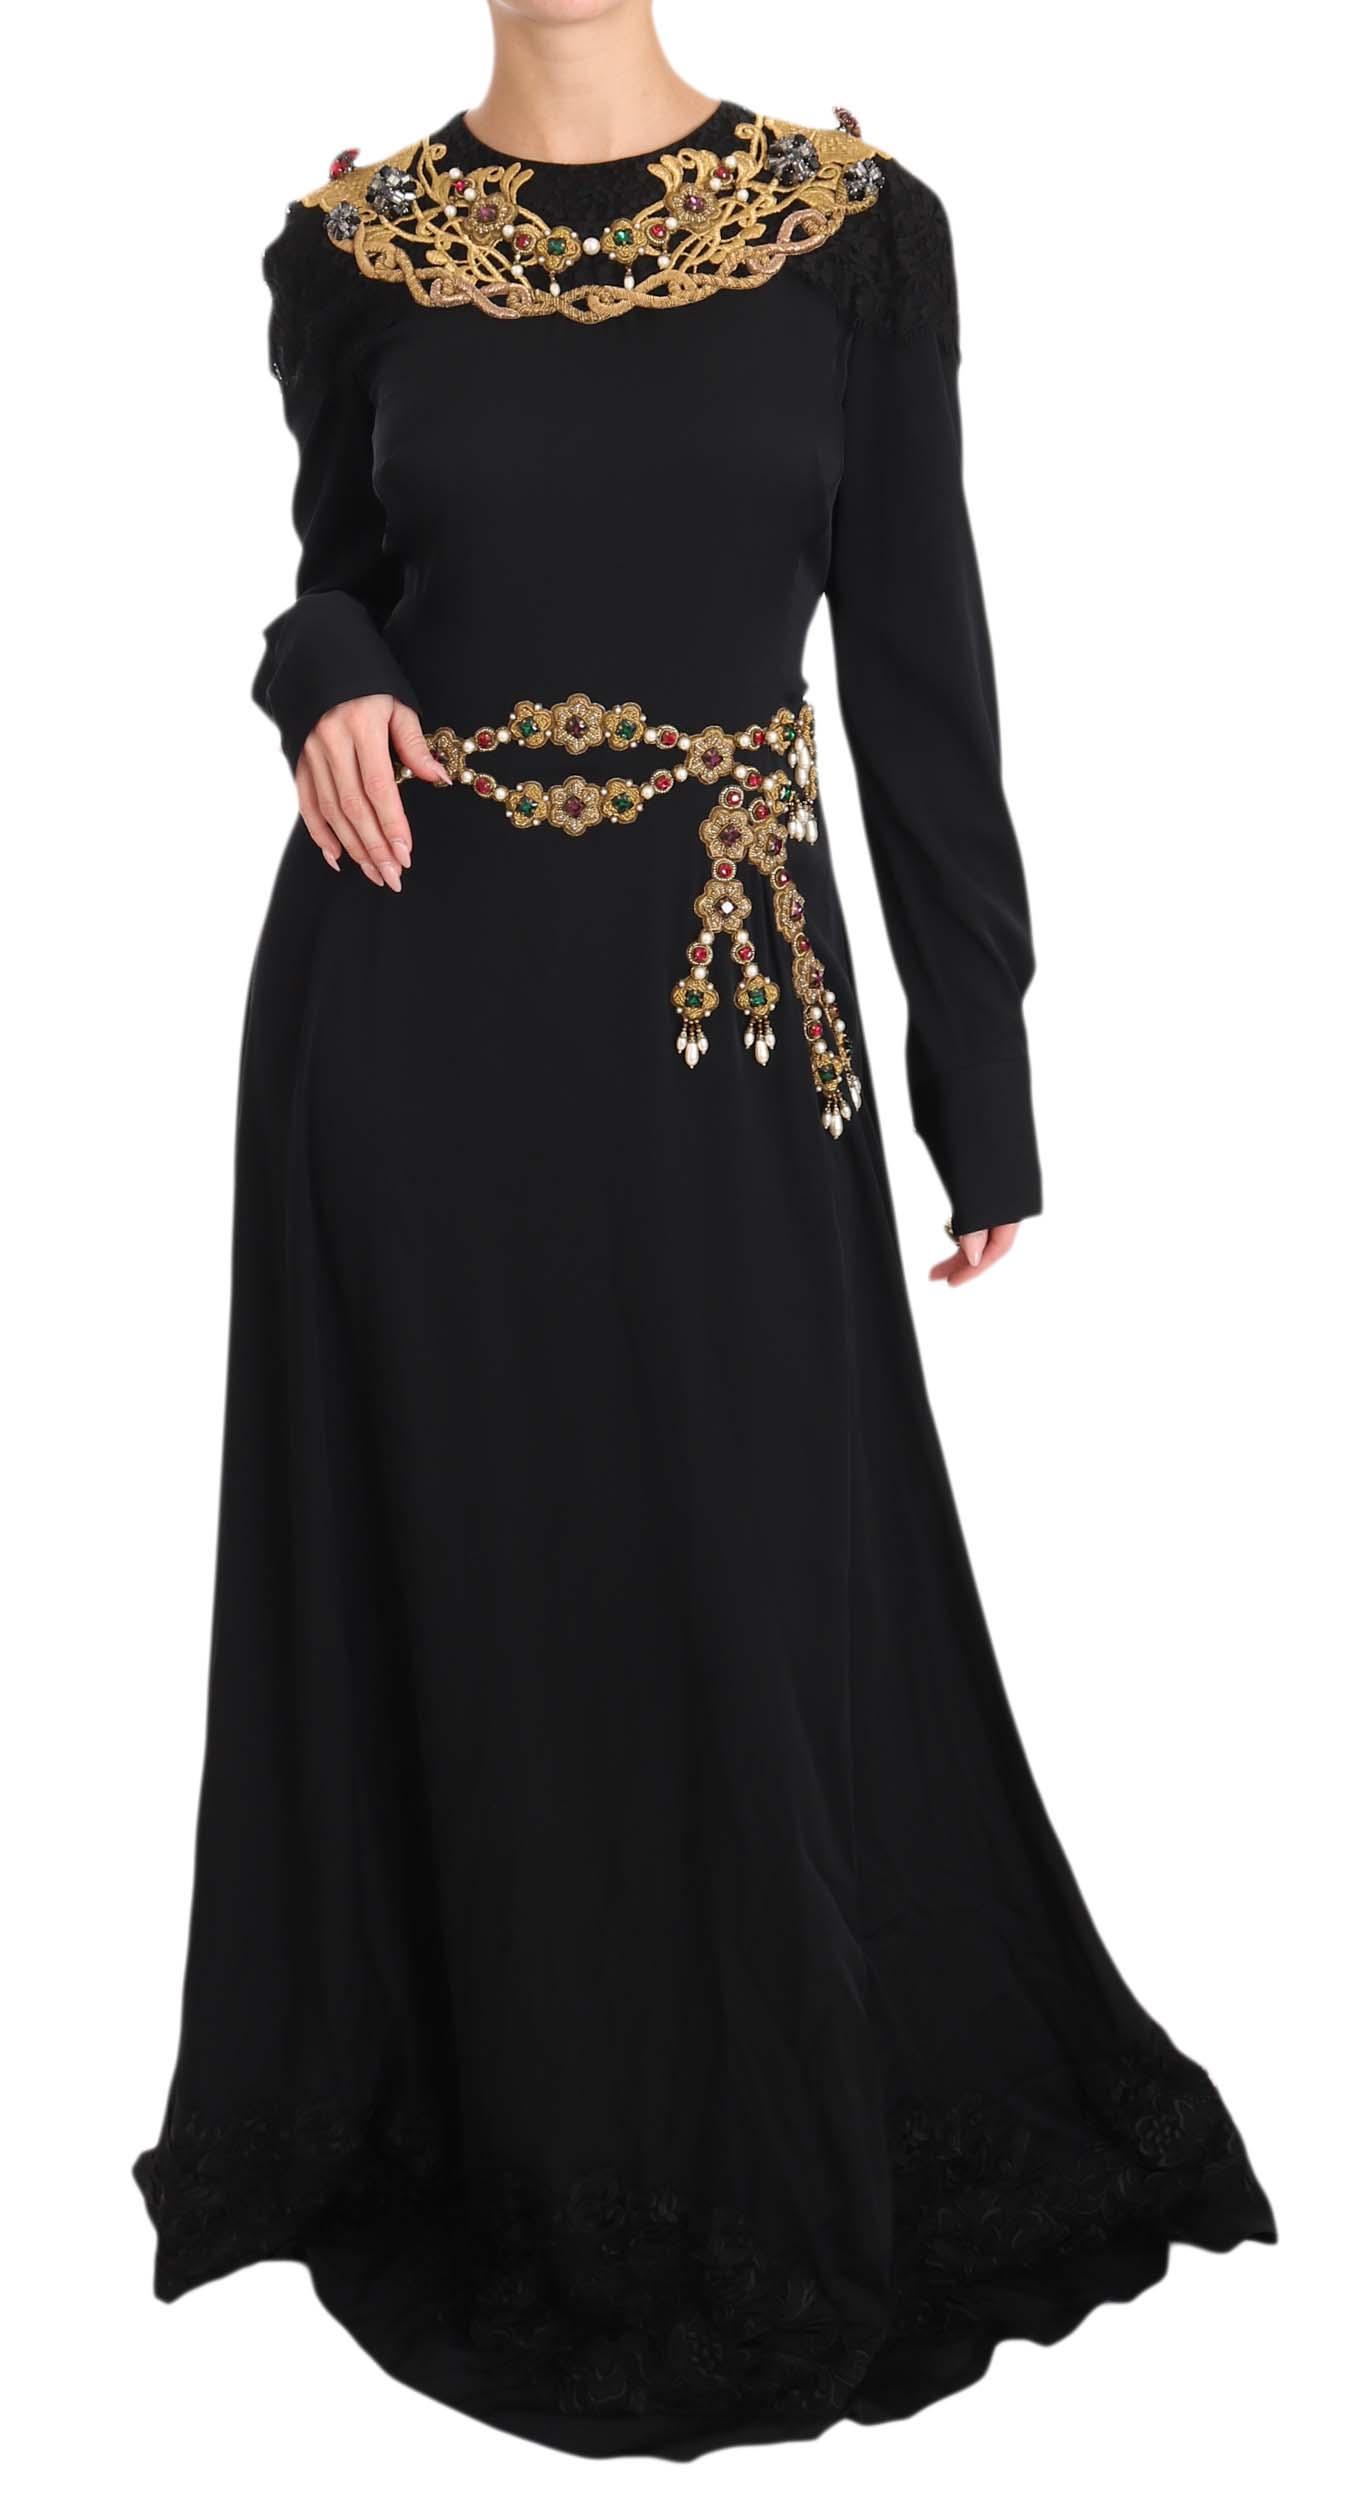 Dolce & Gabbana Women's Silk Stretch Crystal Dress Black DR1587 - IT38 | S